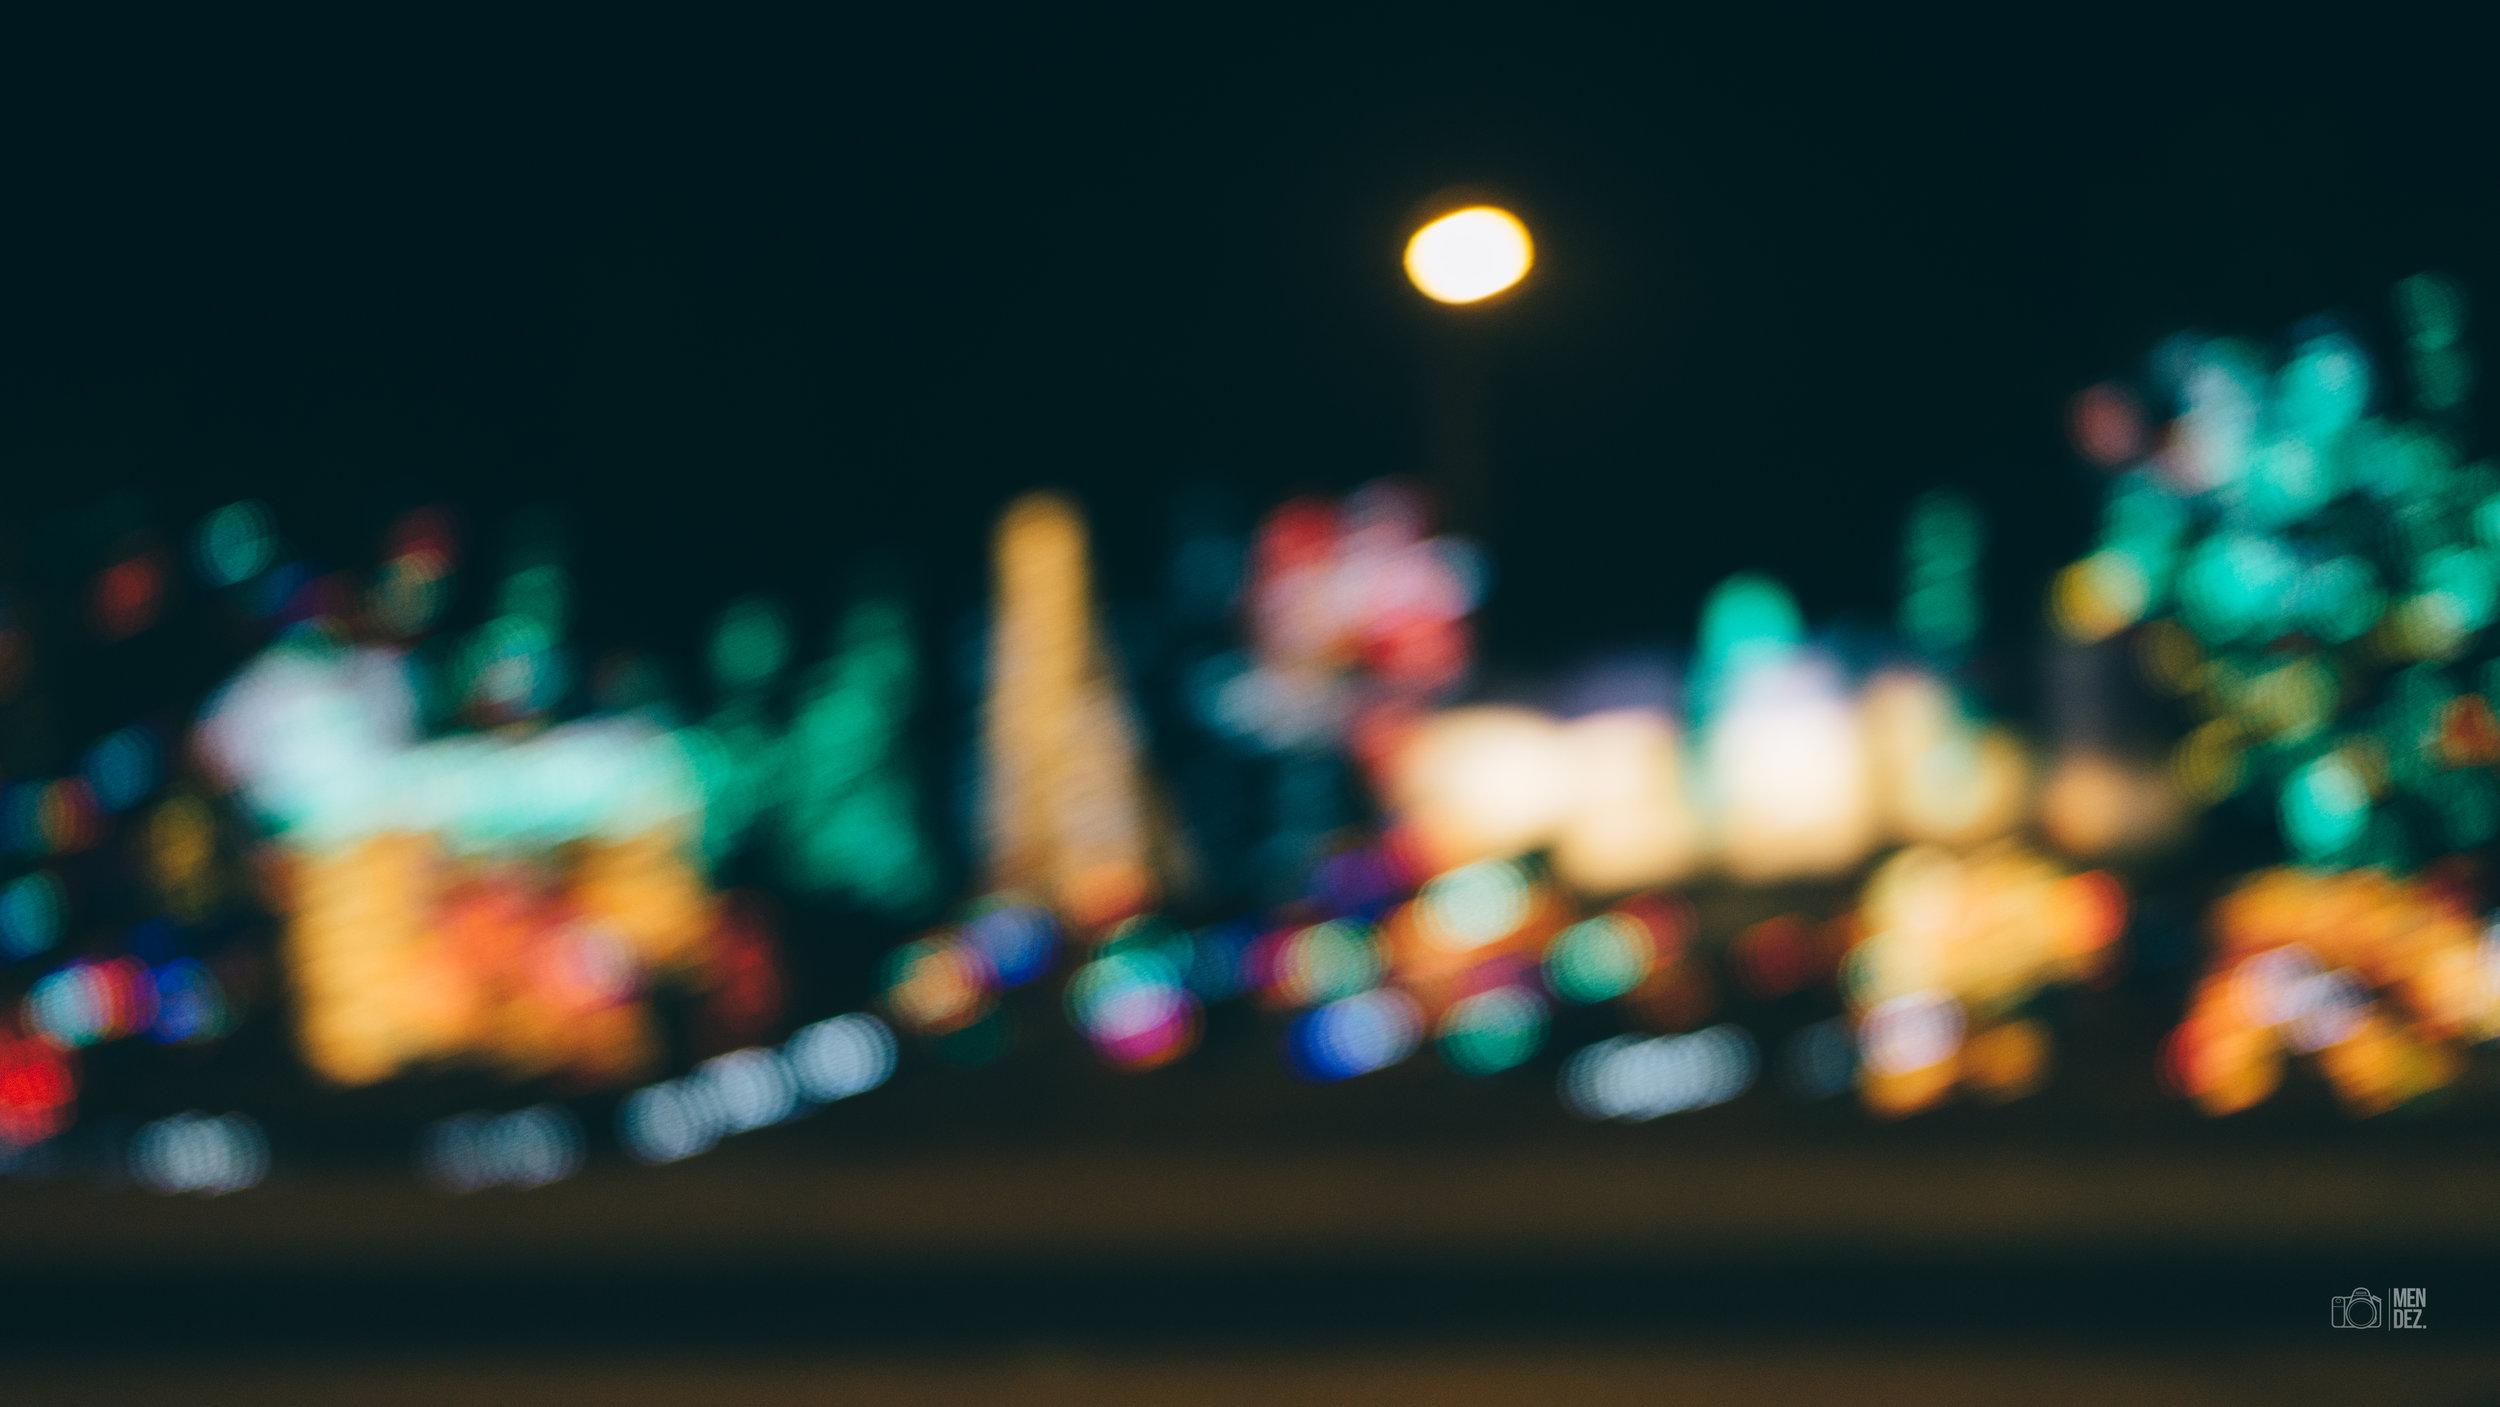 12.30.16 | Las Vegas, NV